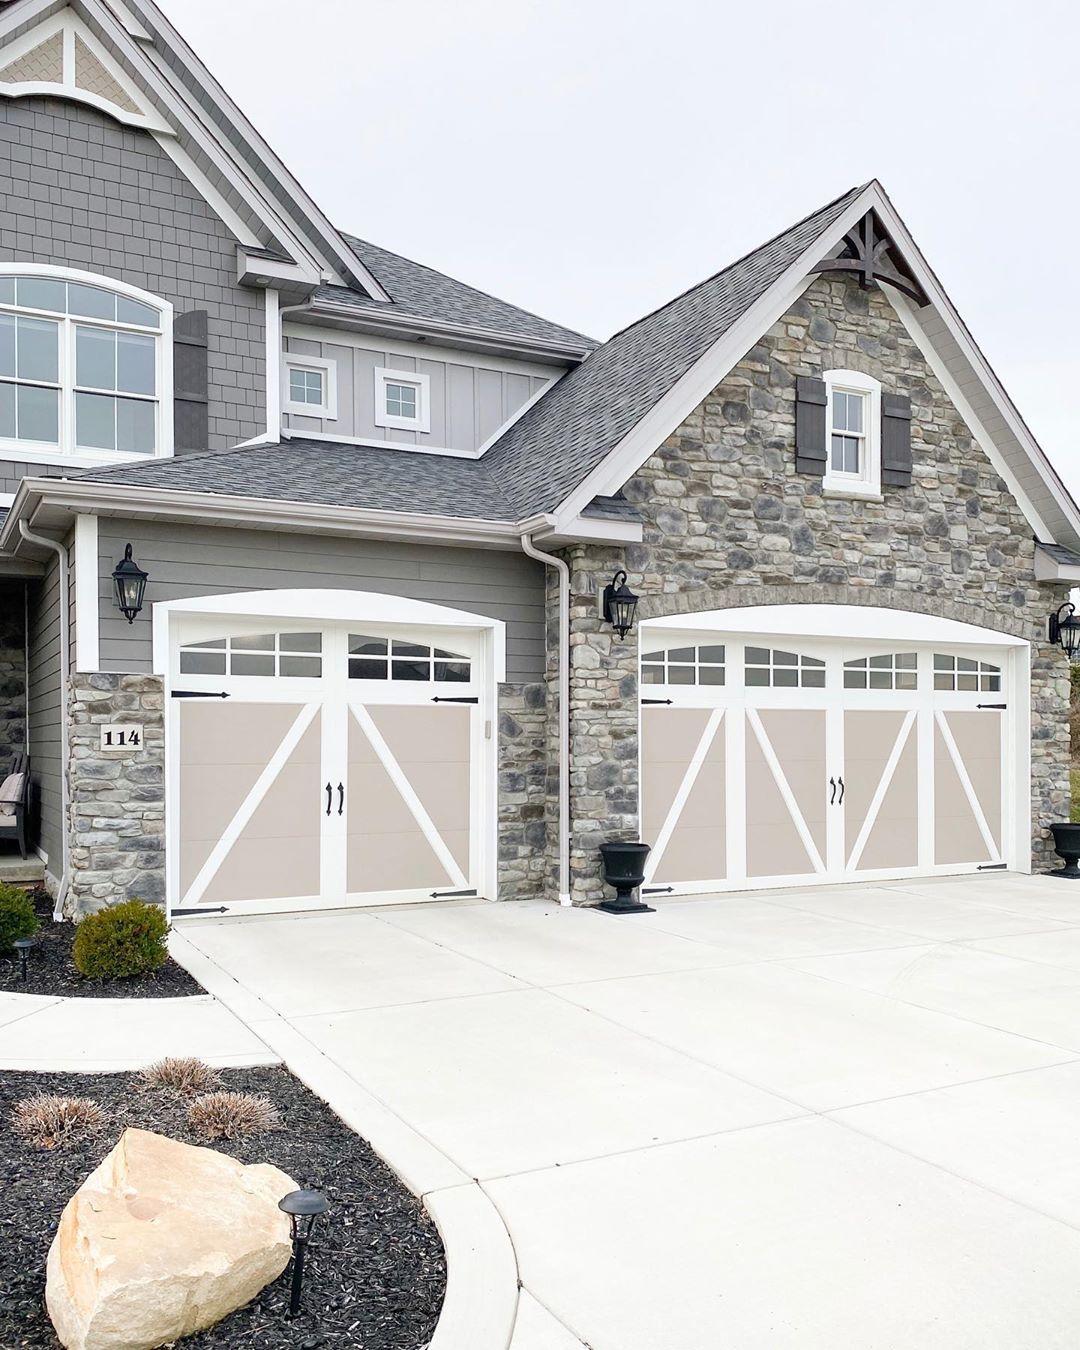 Home Exteriorstone Design Ideas: Board And Batten Siding Blog